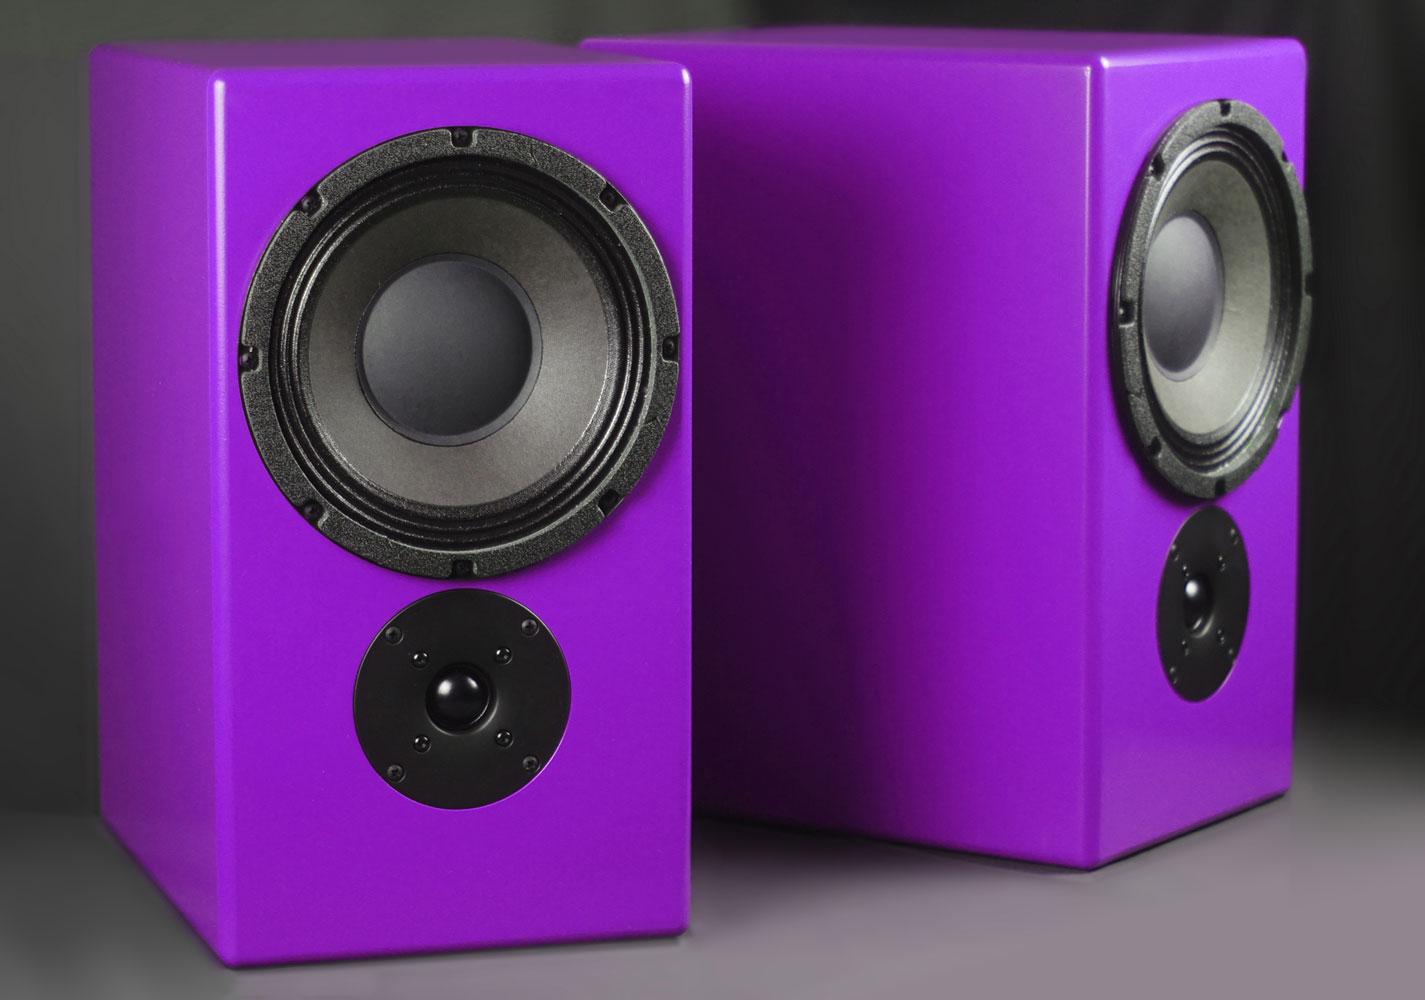 Bookshelf Speakers Hd Media Park Audioengine Hd6 Cherry Tekton Design Mini Lore Monitors Review